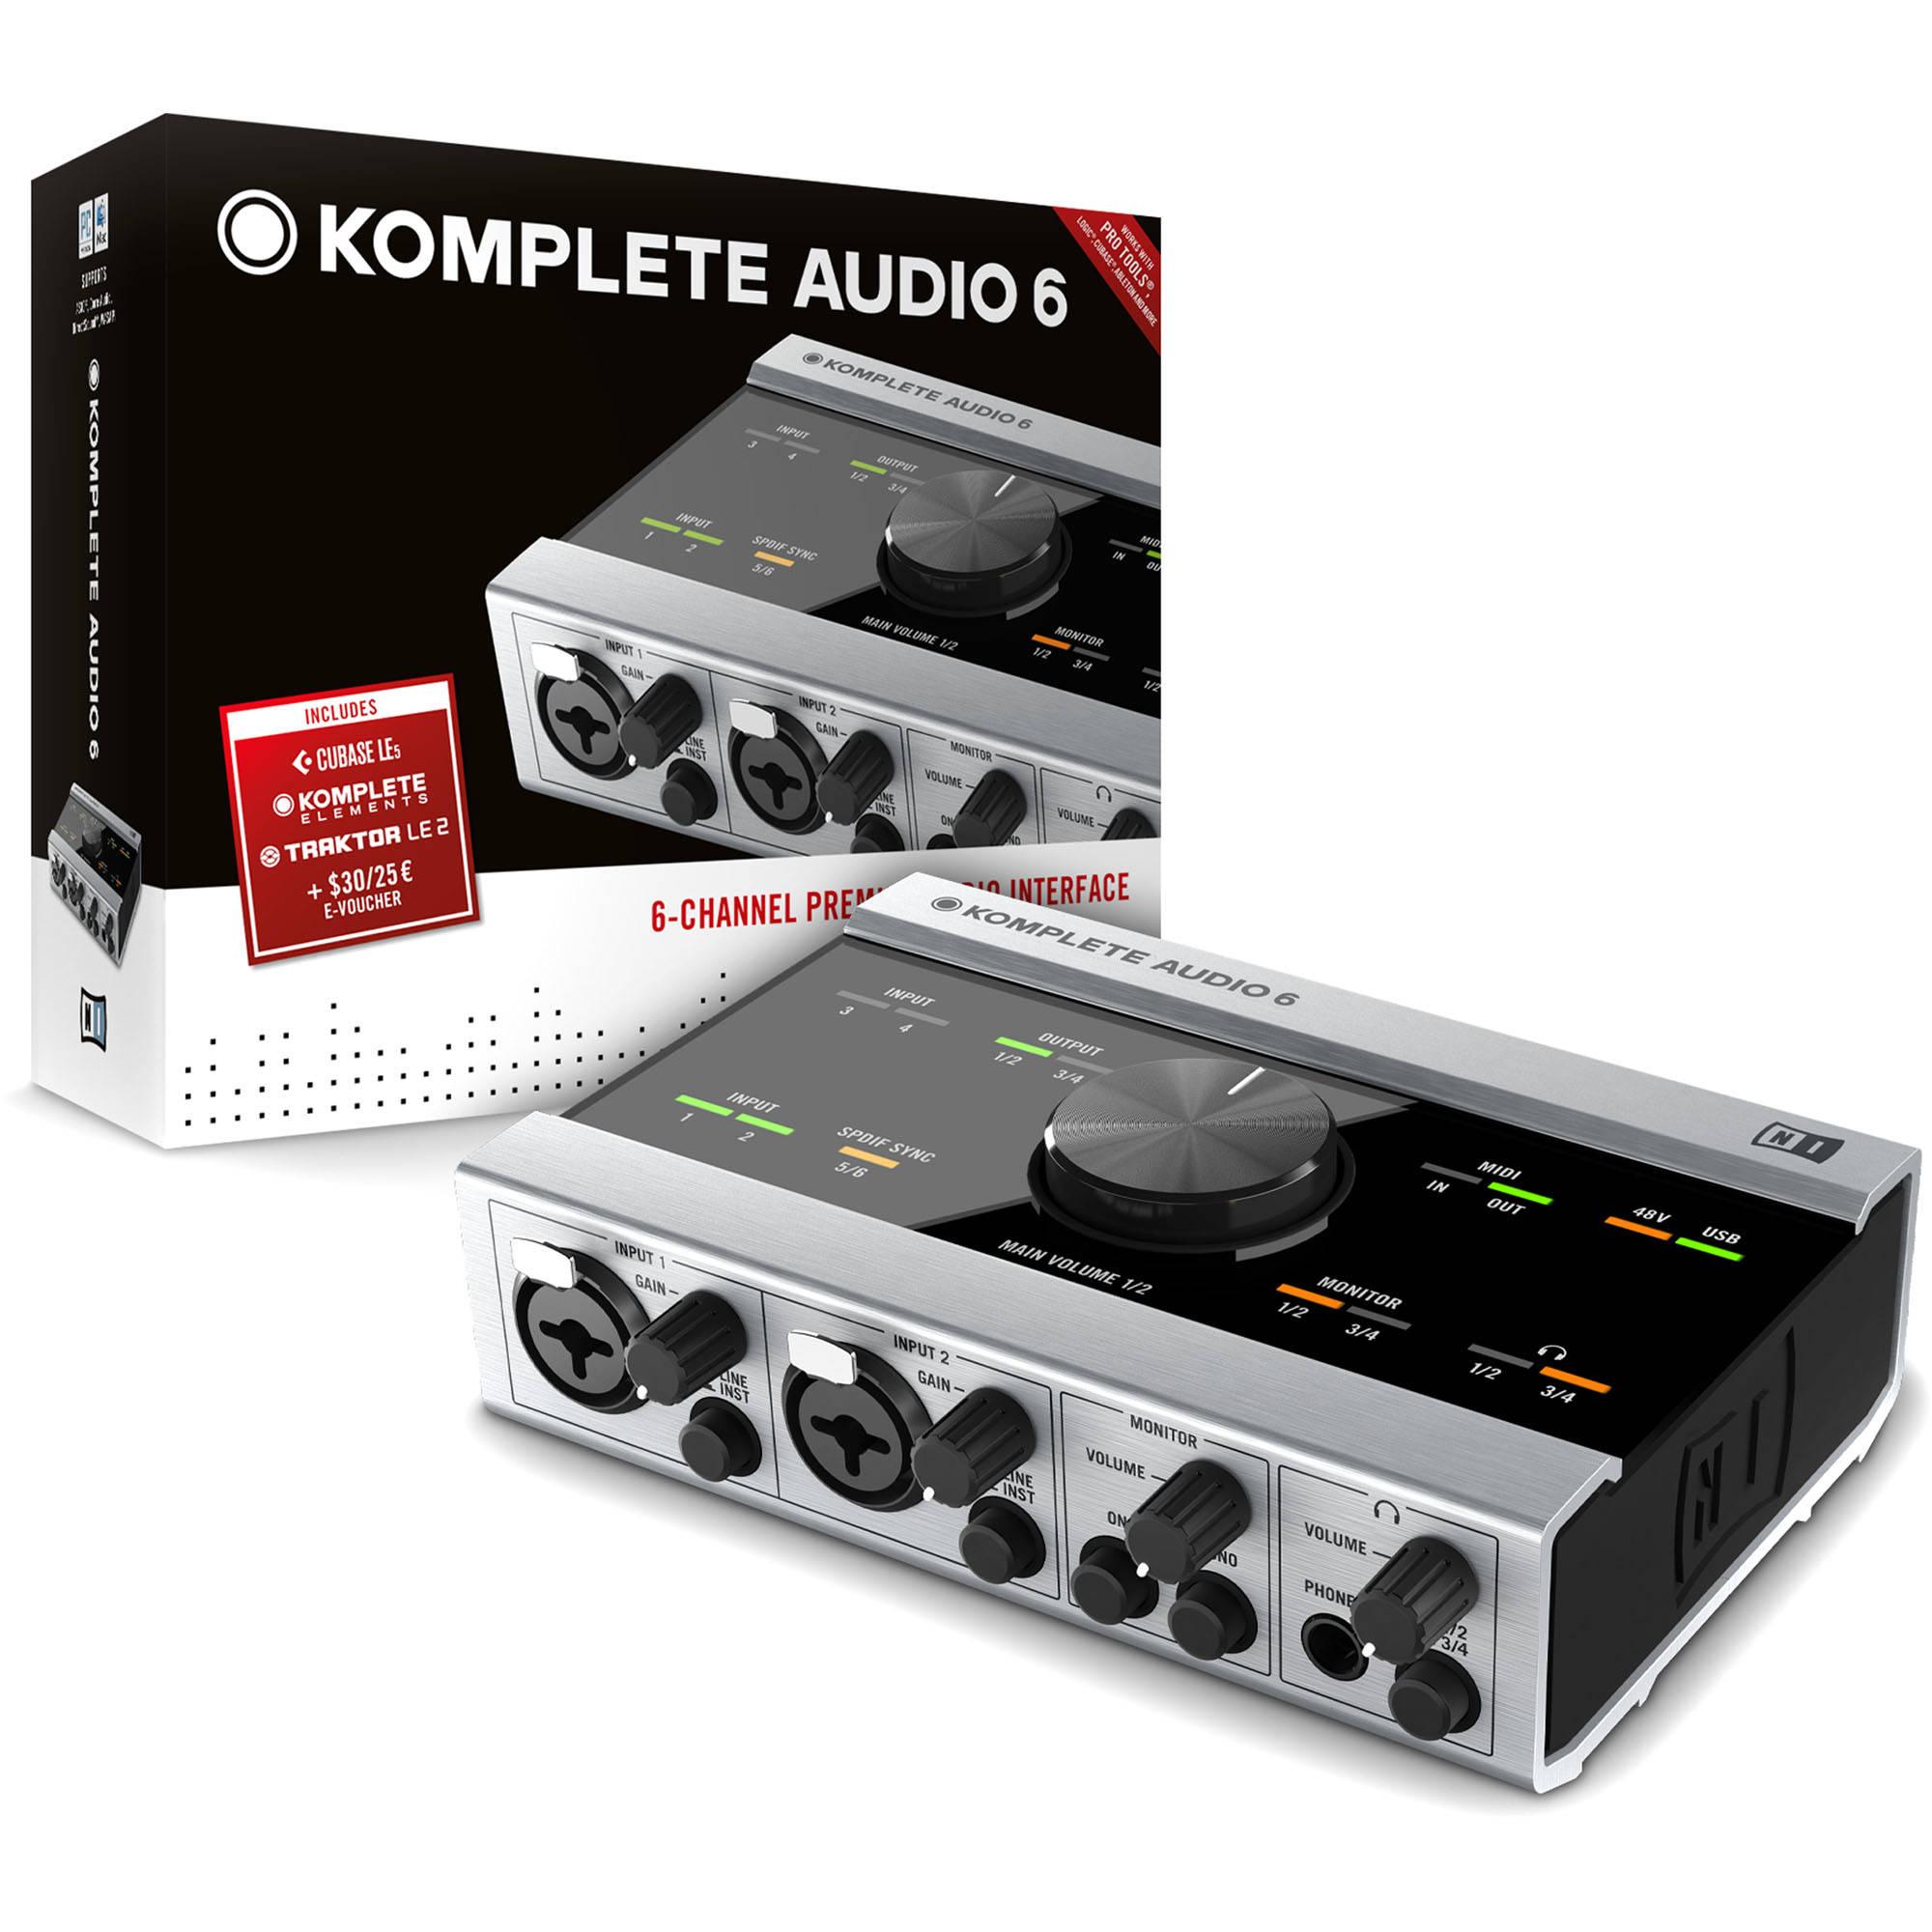 native instruments komplete audio 6 usb 2 0 digital audio b h. Black Bedroom Furniture Sets. Home Design Ideas